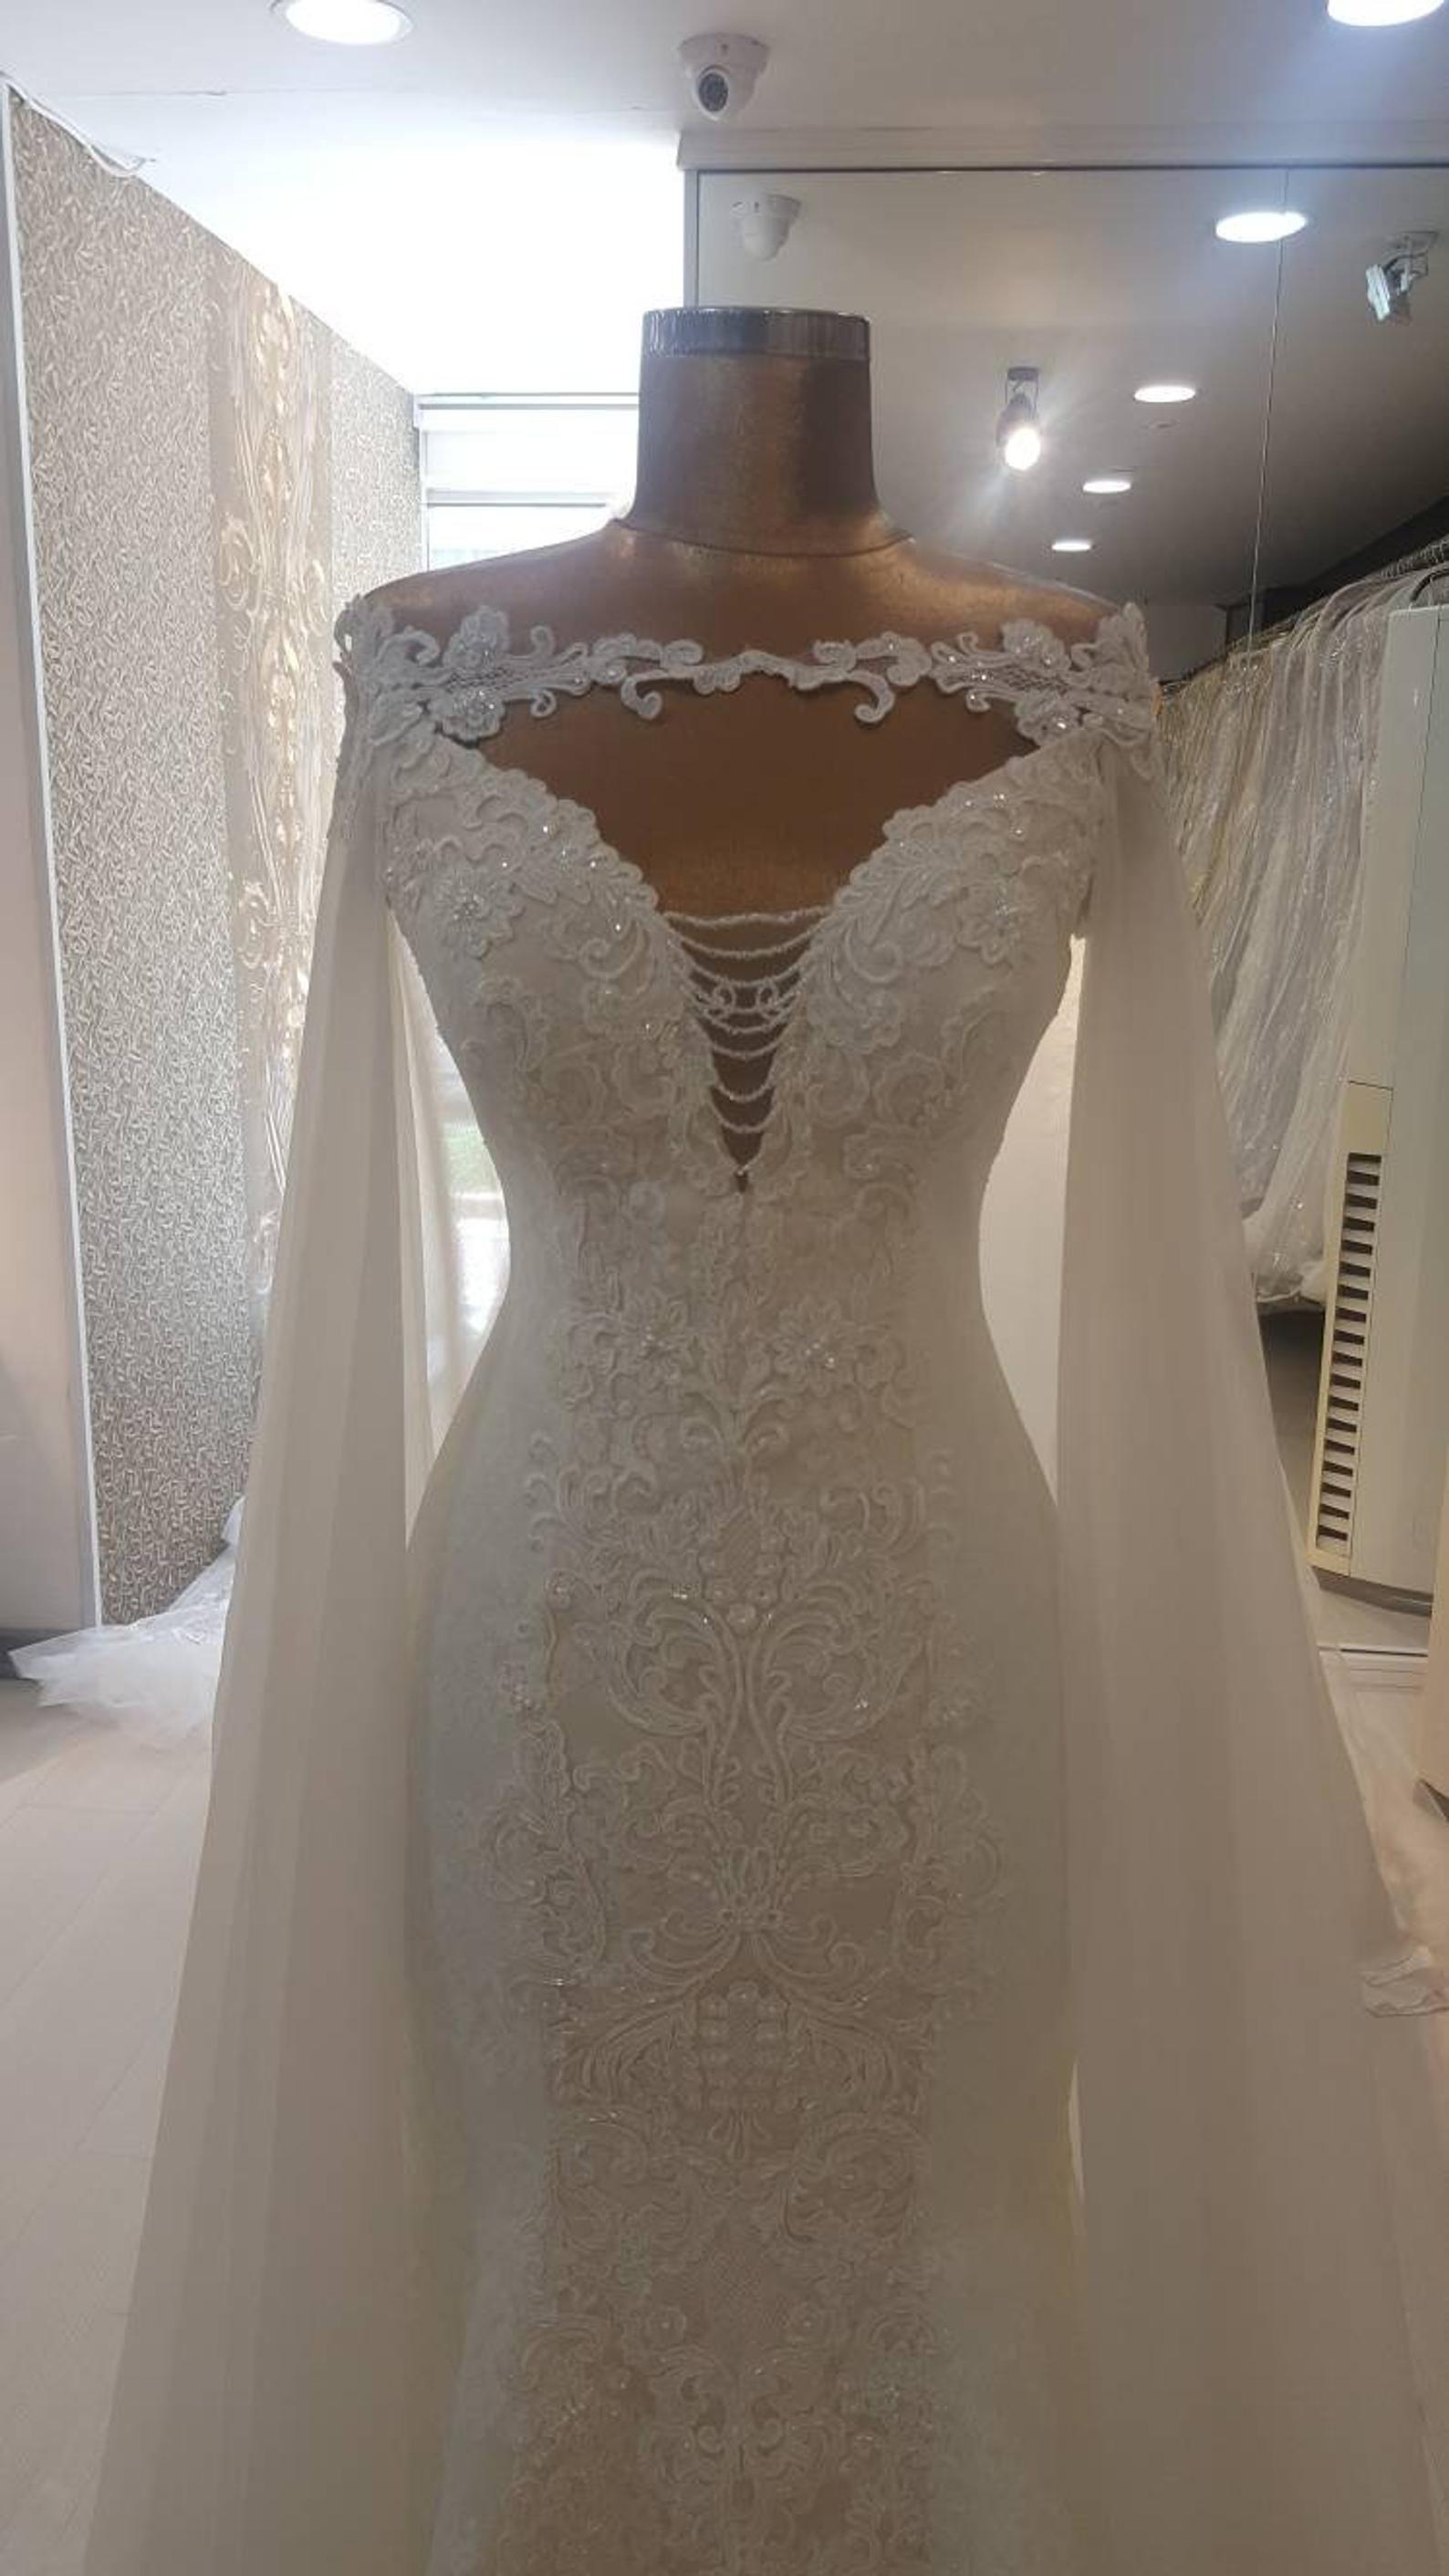 Berta Bridal Inspiré Robe de mariée sirène avec manteau | Etsy